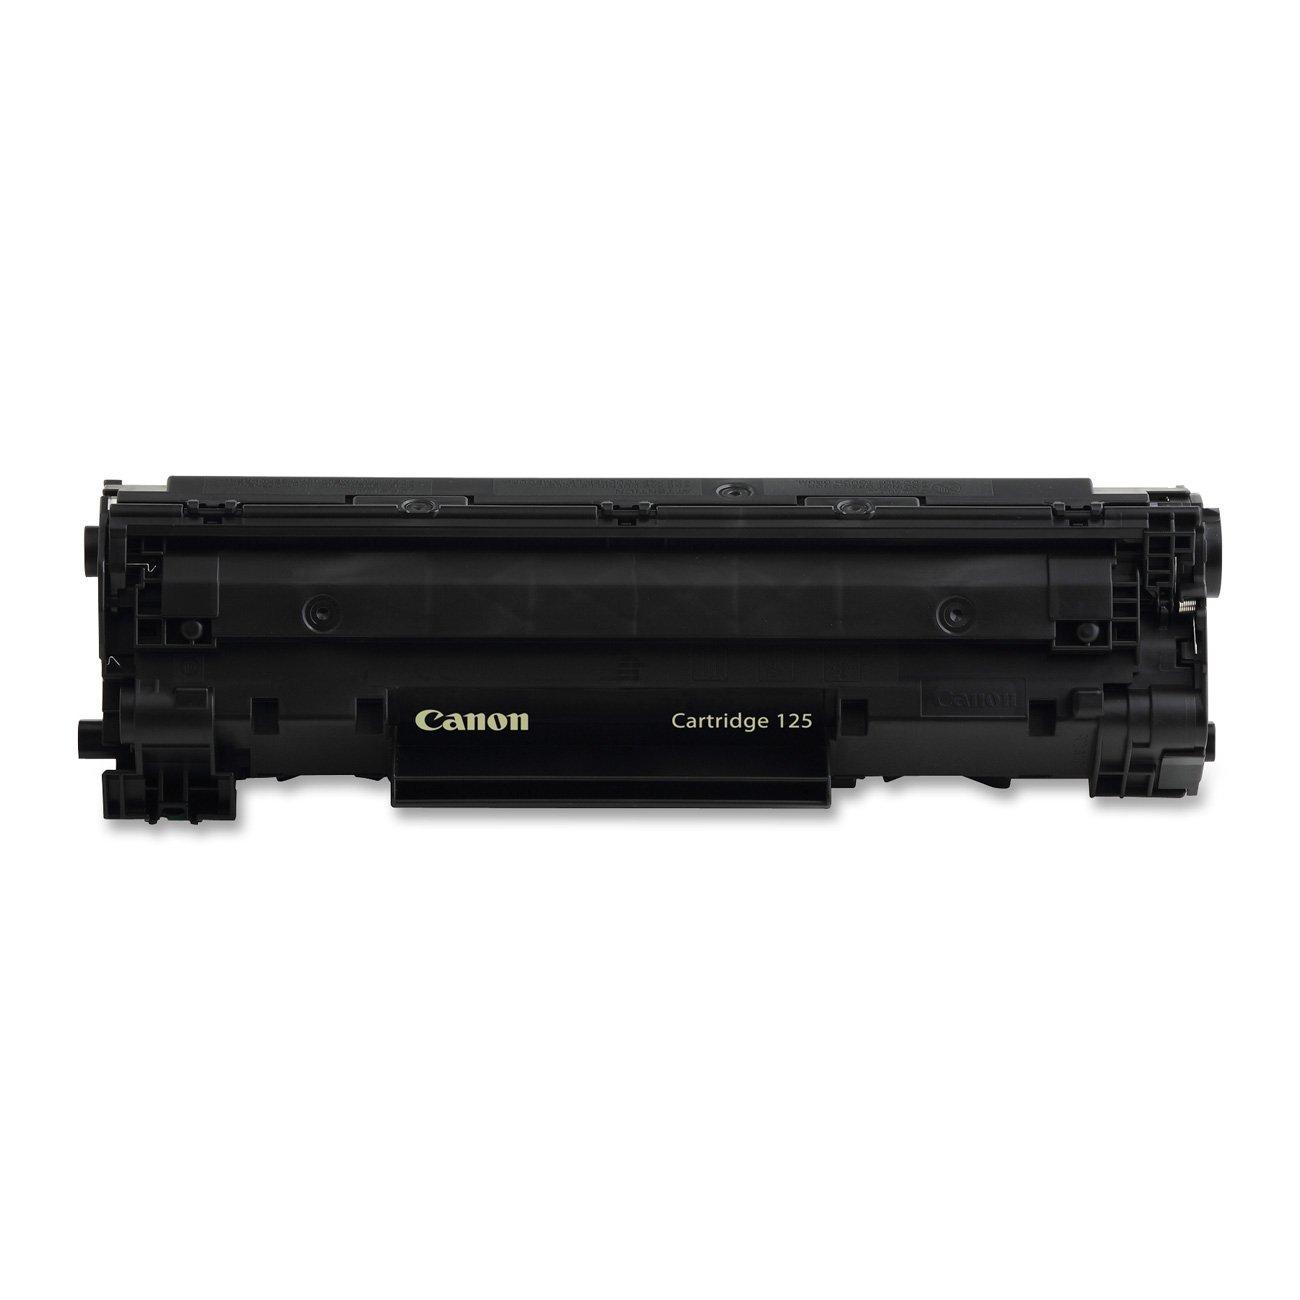 amazon com canon original 125 toner cartridge black office